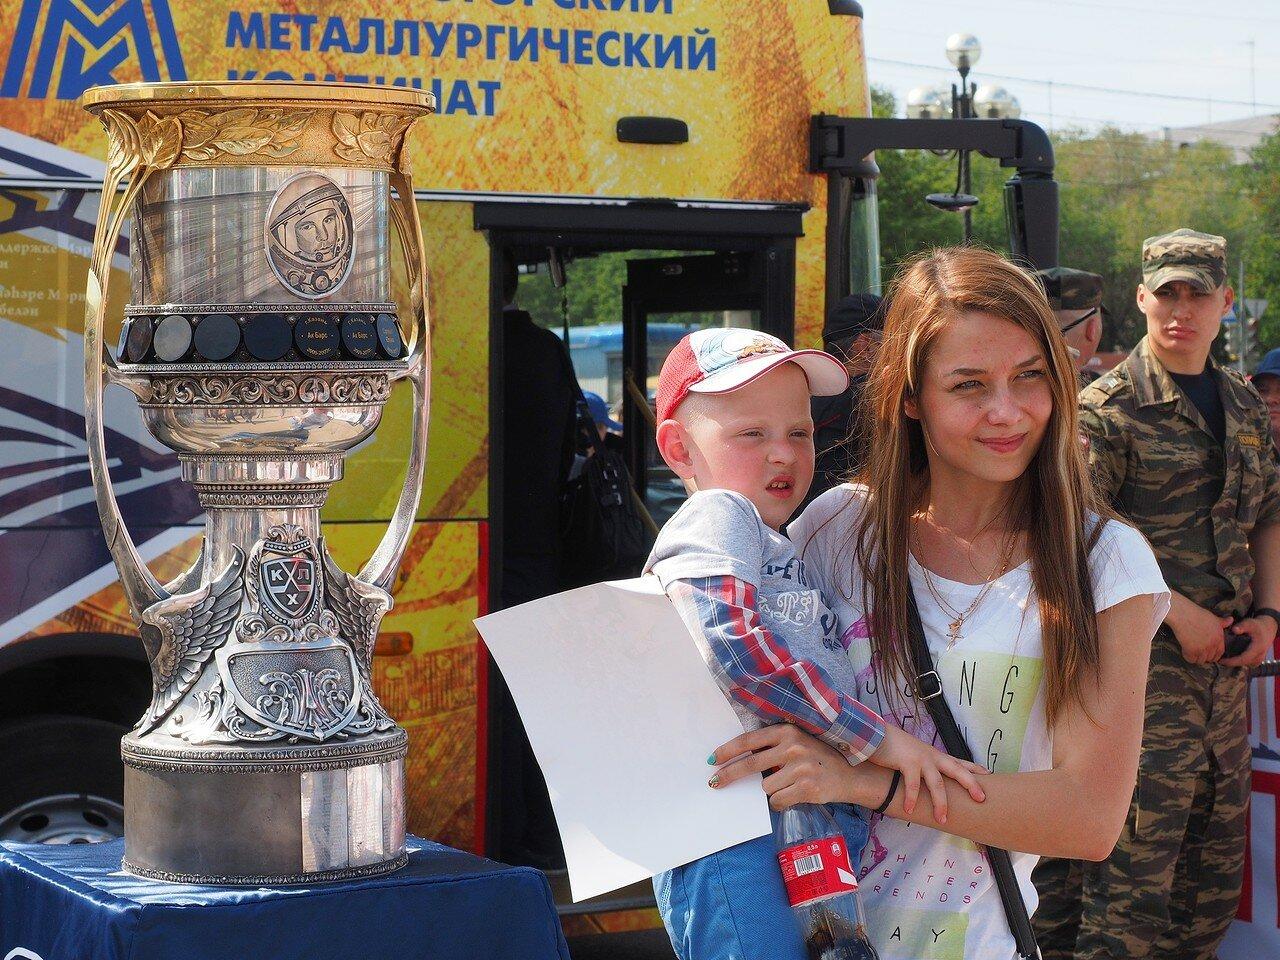 182Церемония чествования команды Металлург27.05.2016